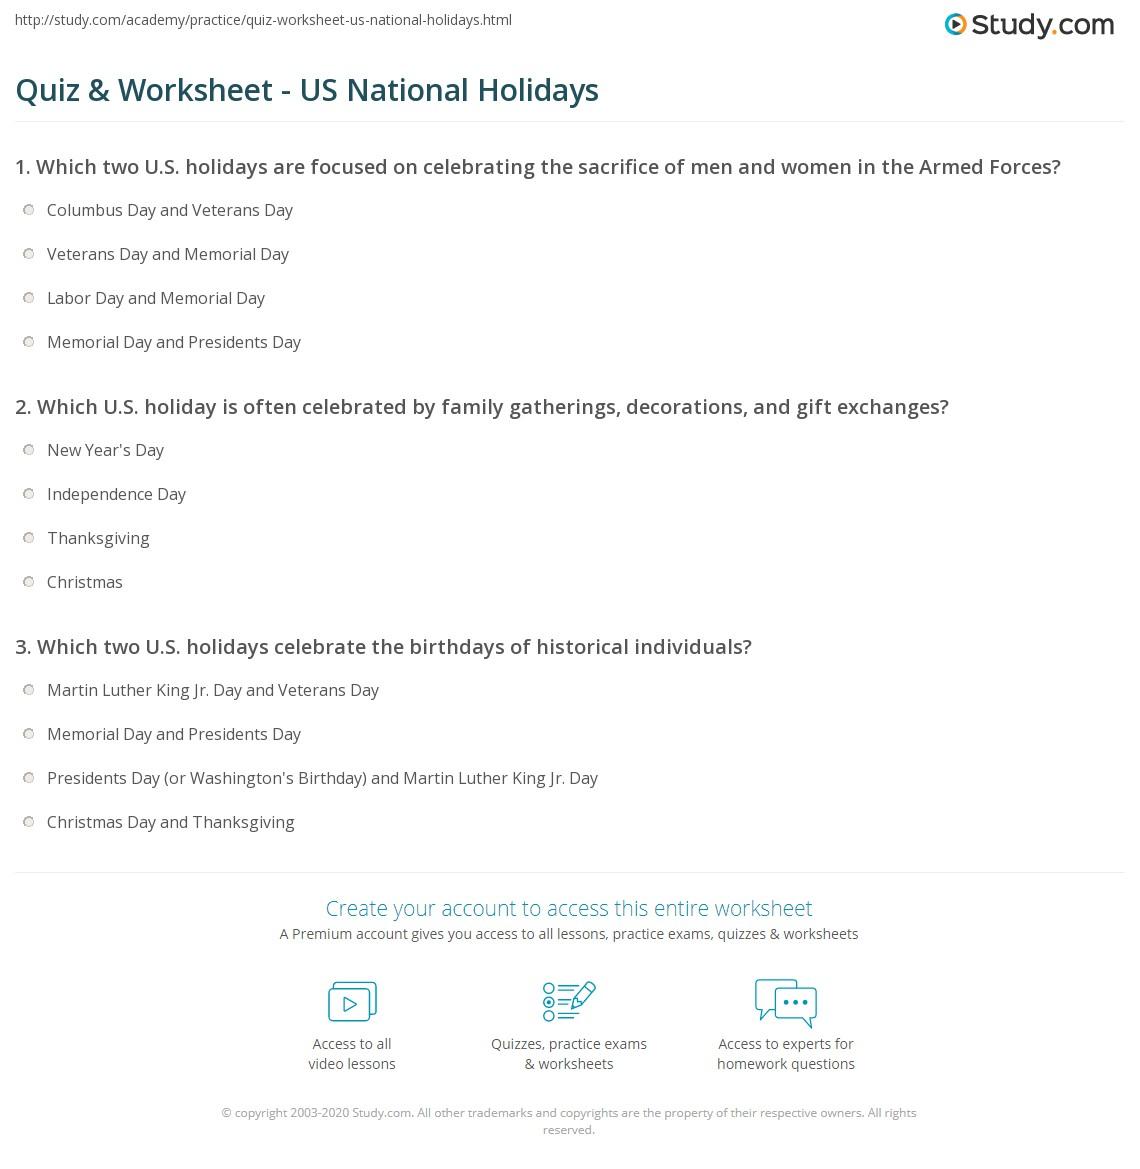 Quiz & Worksheet - US National Holidays | Study.com